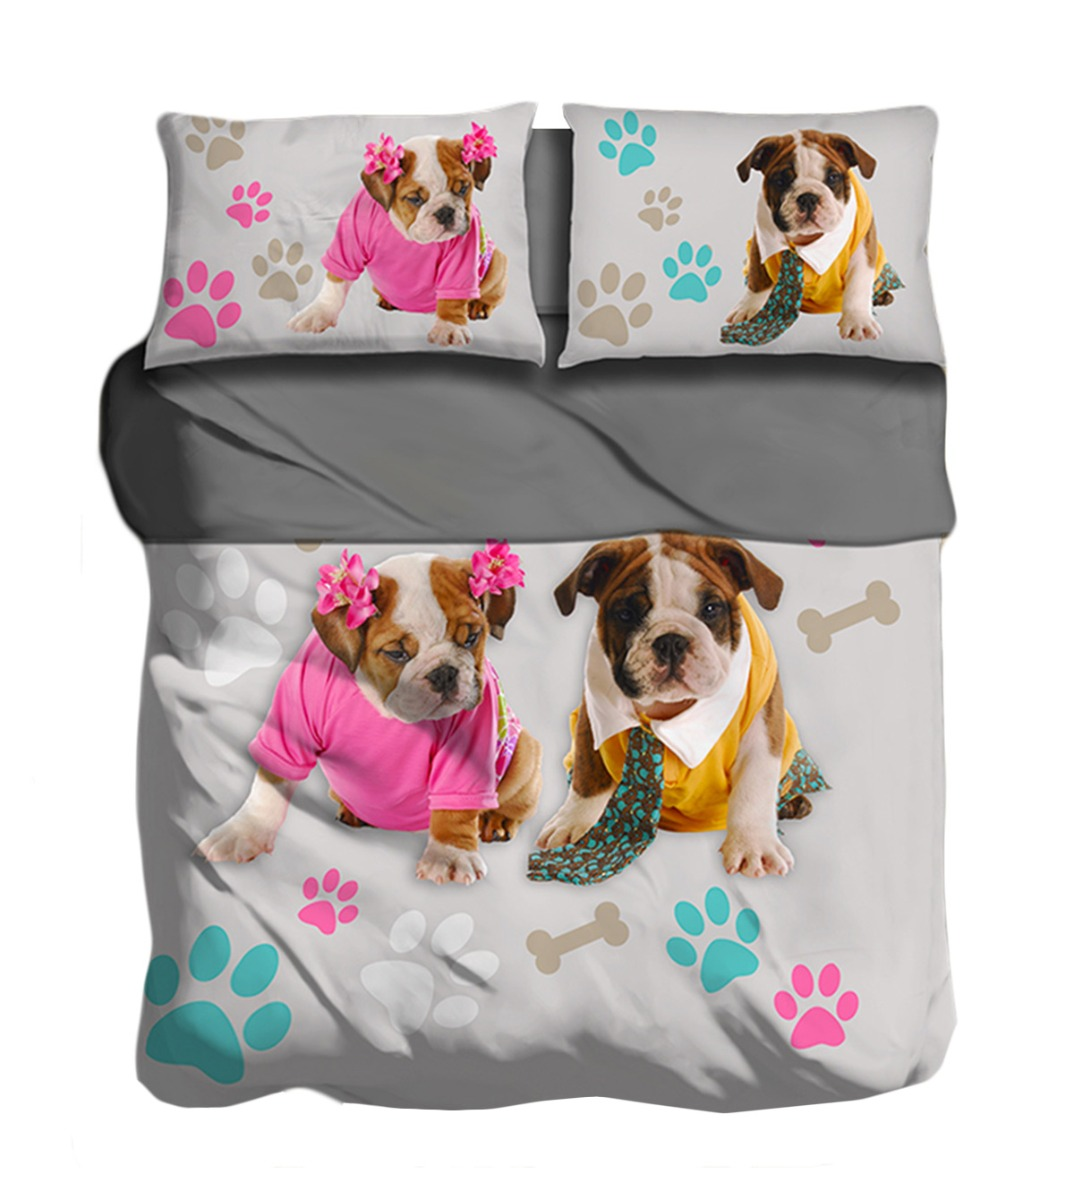 Lenzuola Matrimoniali Cani.Completo Lenzuola Bull Dog Matrimoniale Copriletto Stampa Digitale